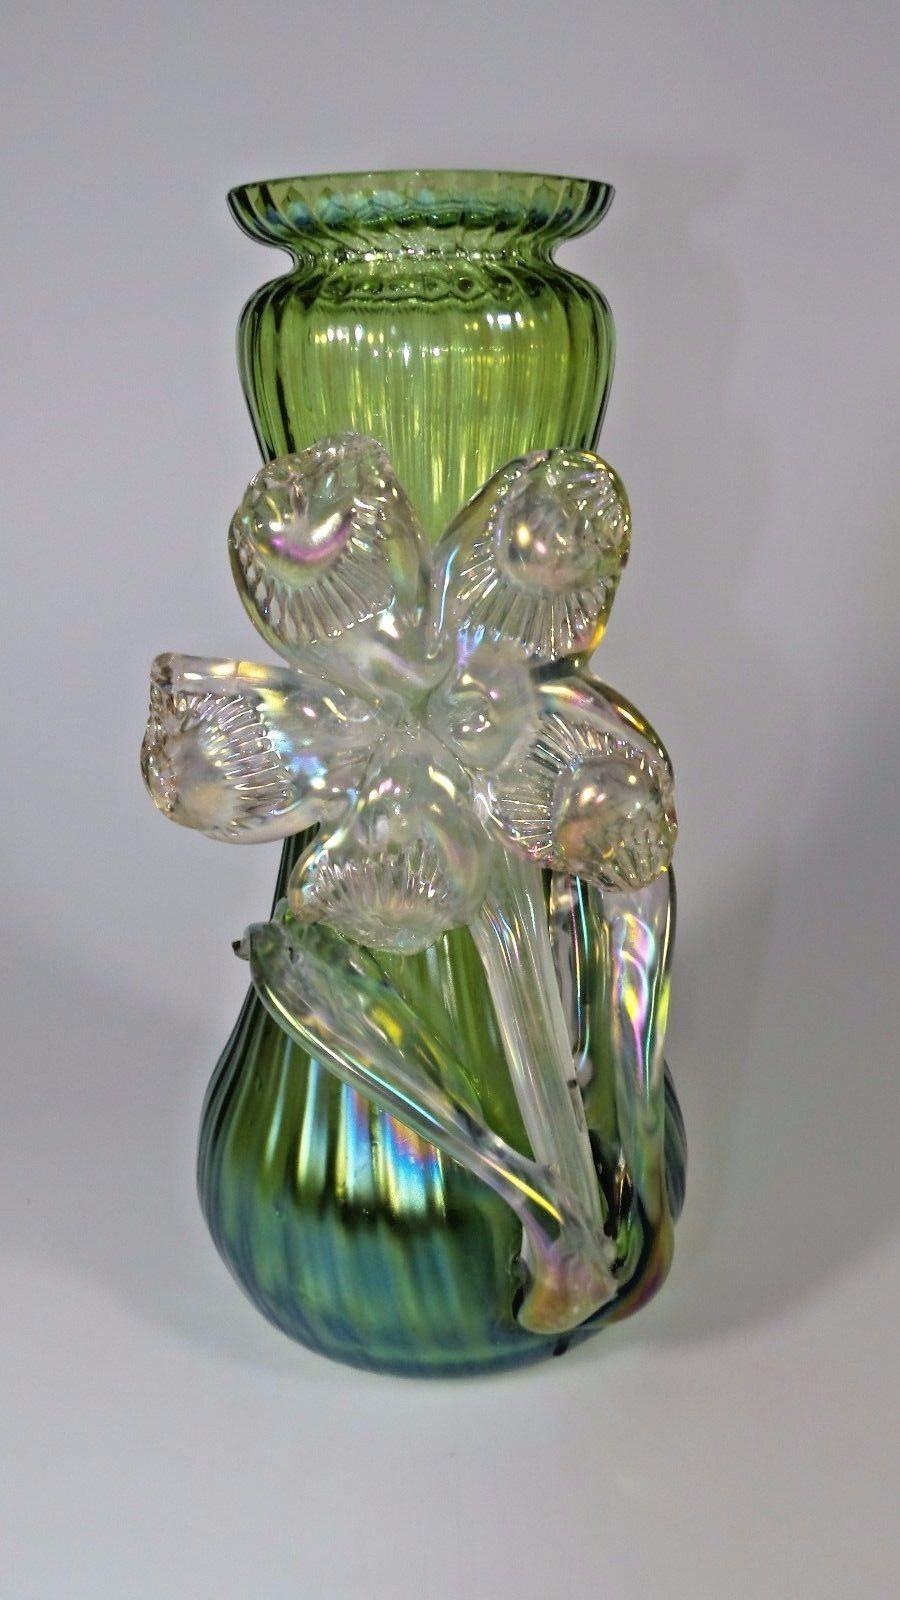 Art Deco Vases Antique Of Vintage Blown Glass Vase Gallery Antique Glass Living Room Crystal with Regard to Vintage Blown Glass Vase Pictures Vintage Art Nouveau Kralik Green Iridescent Art Glass Vase W Applied